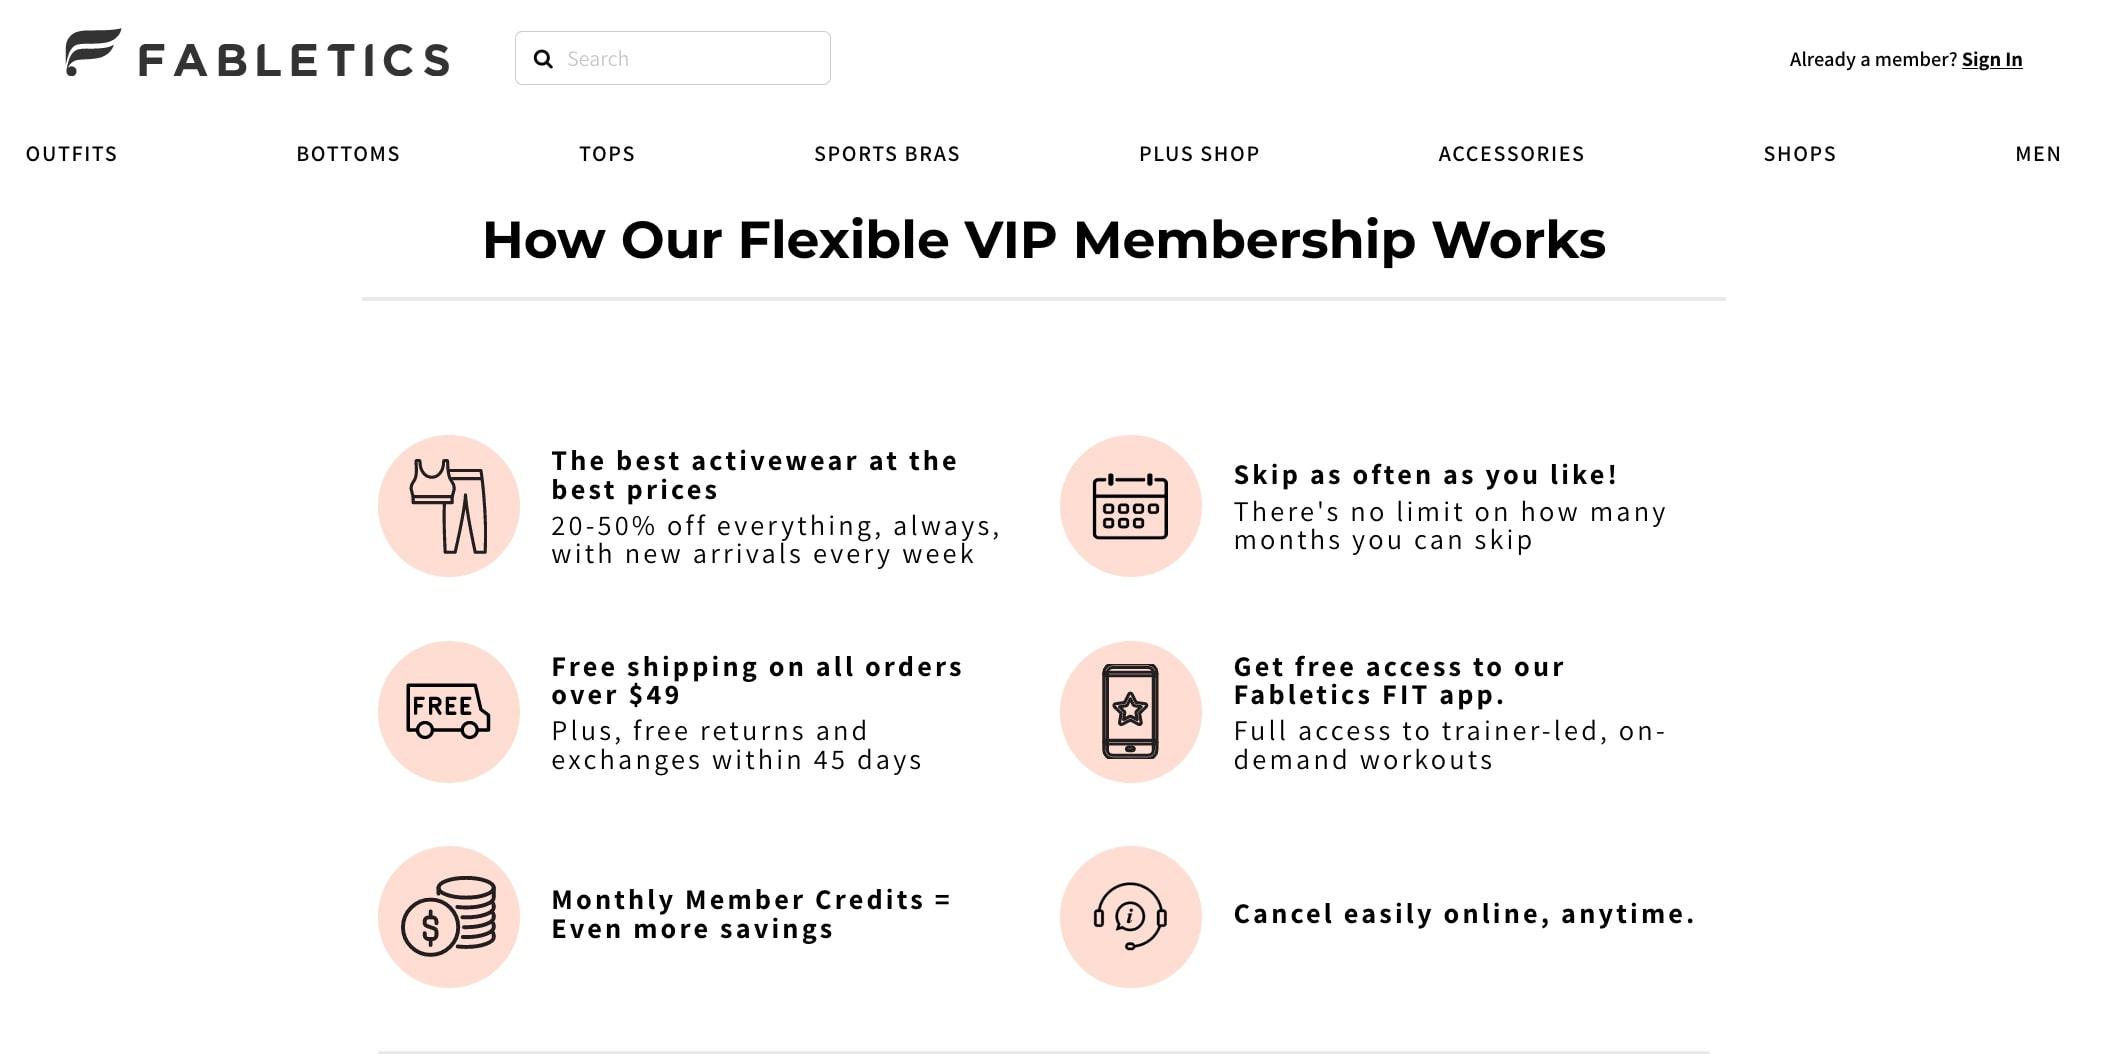 Fabletics info on their loyalty program